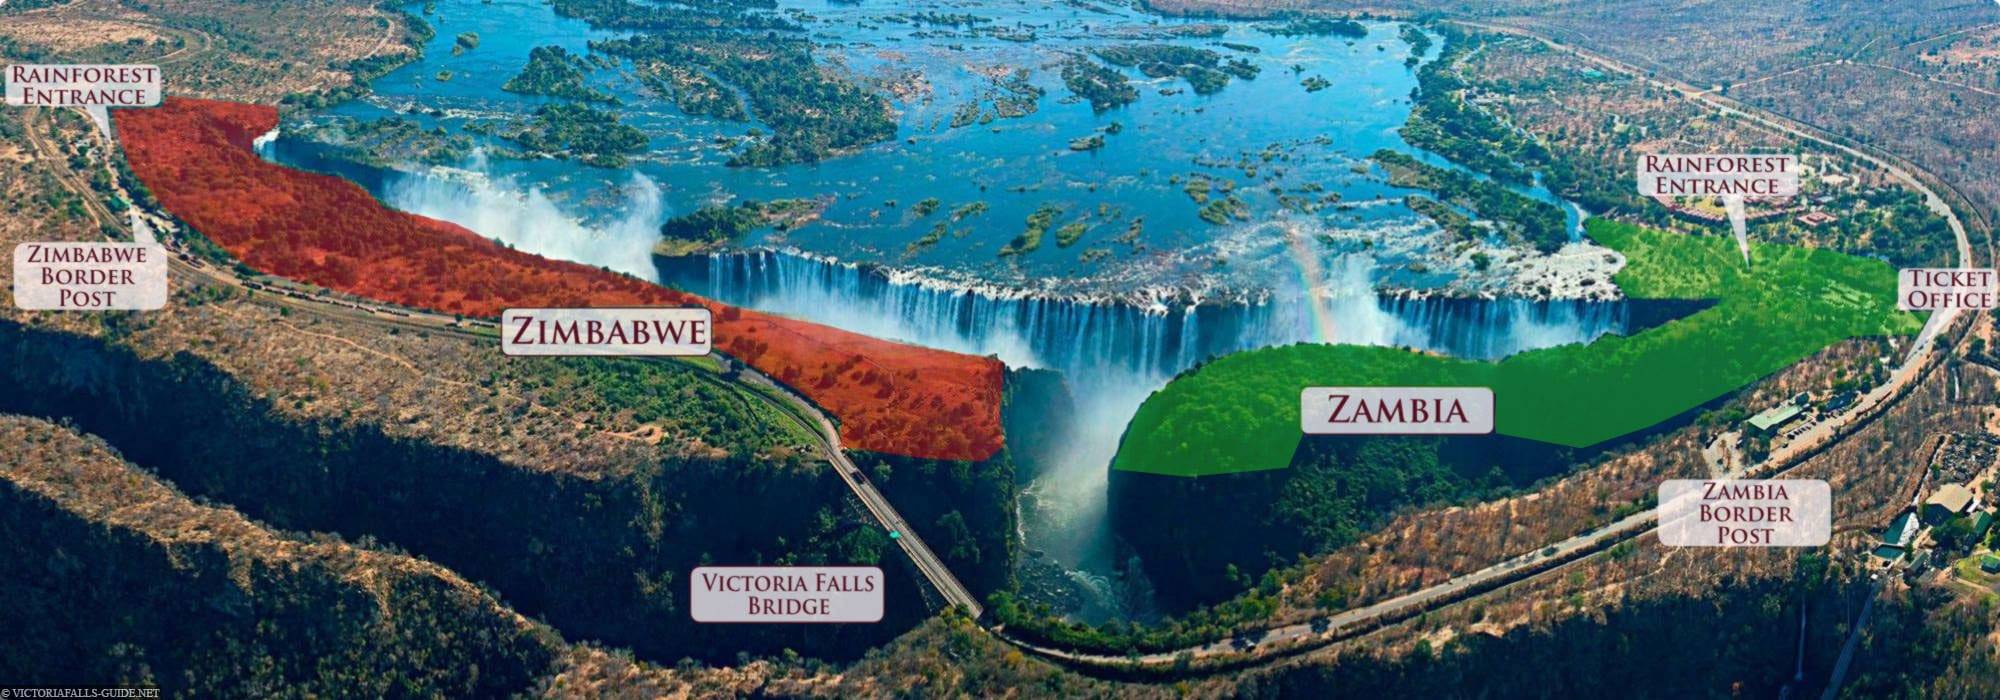 Victoriafälle, Karte, Sambia Seite, Simbabwe Seite, Nationalpark, Map, Reisebericht, Afrika